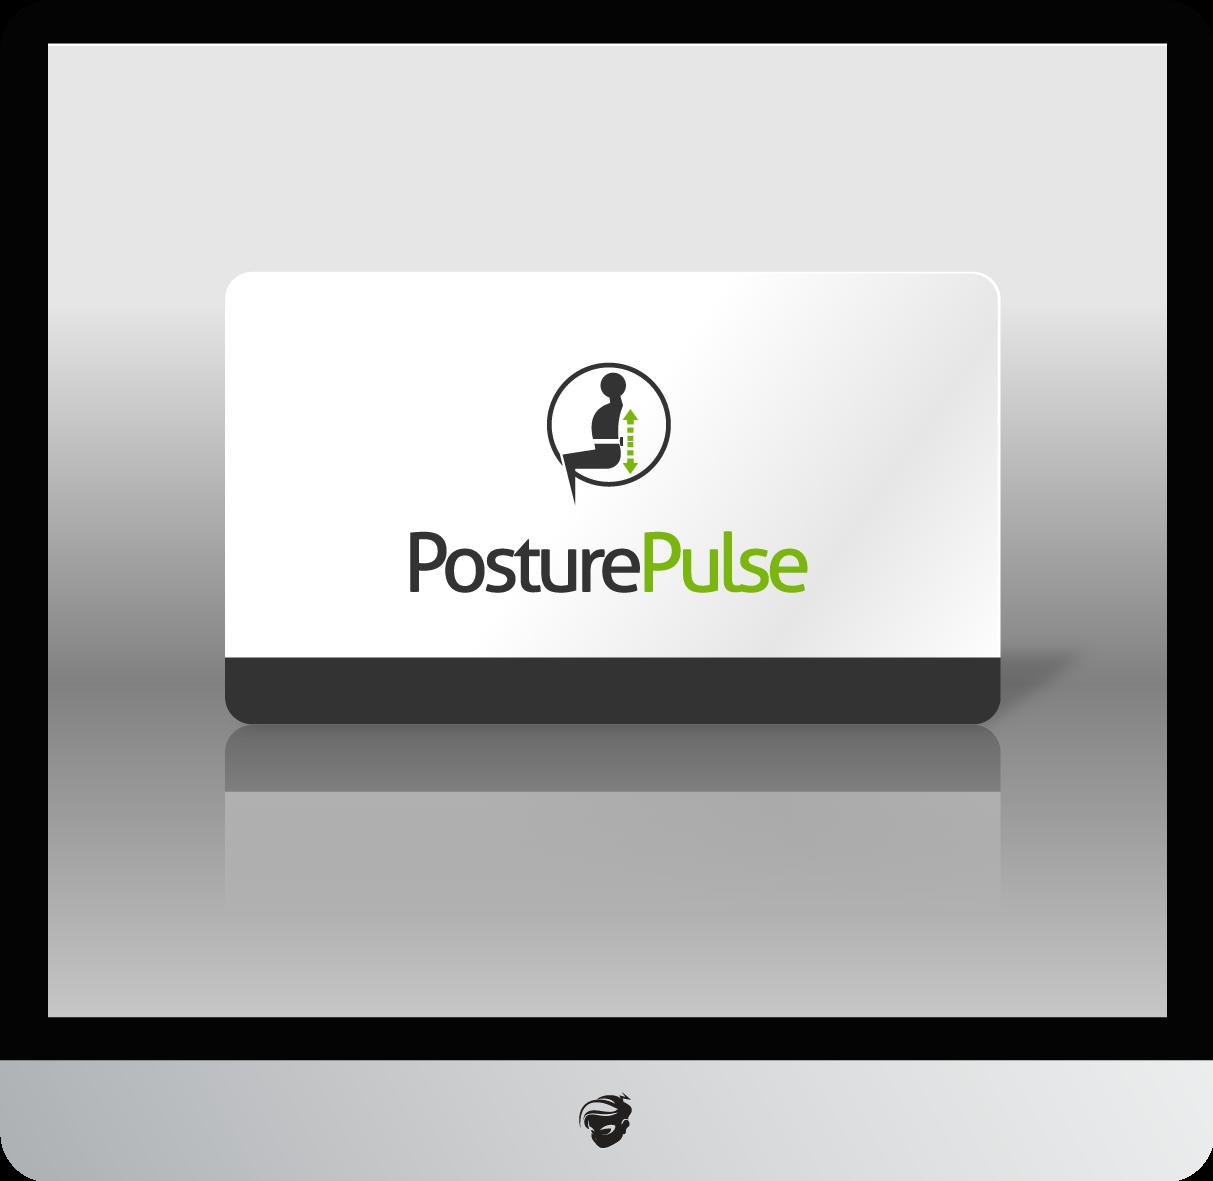 Logo Design by zesthar - Entry No. 110 in the Logo Design Contest Unique Logo Design Wanted for PosturePulse.